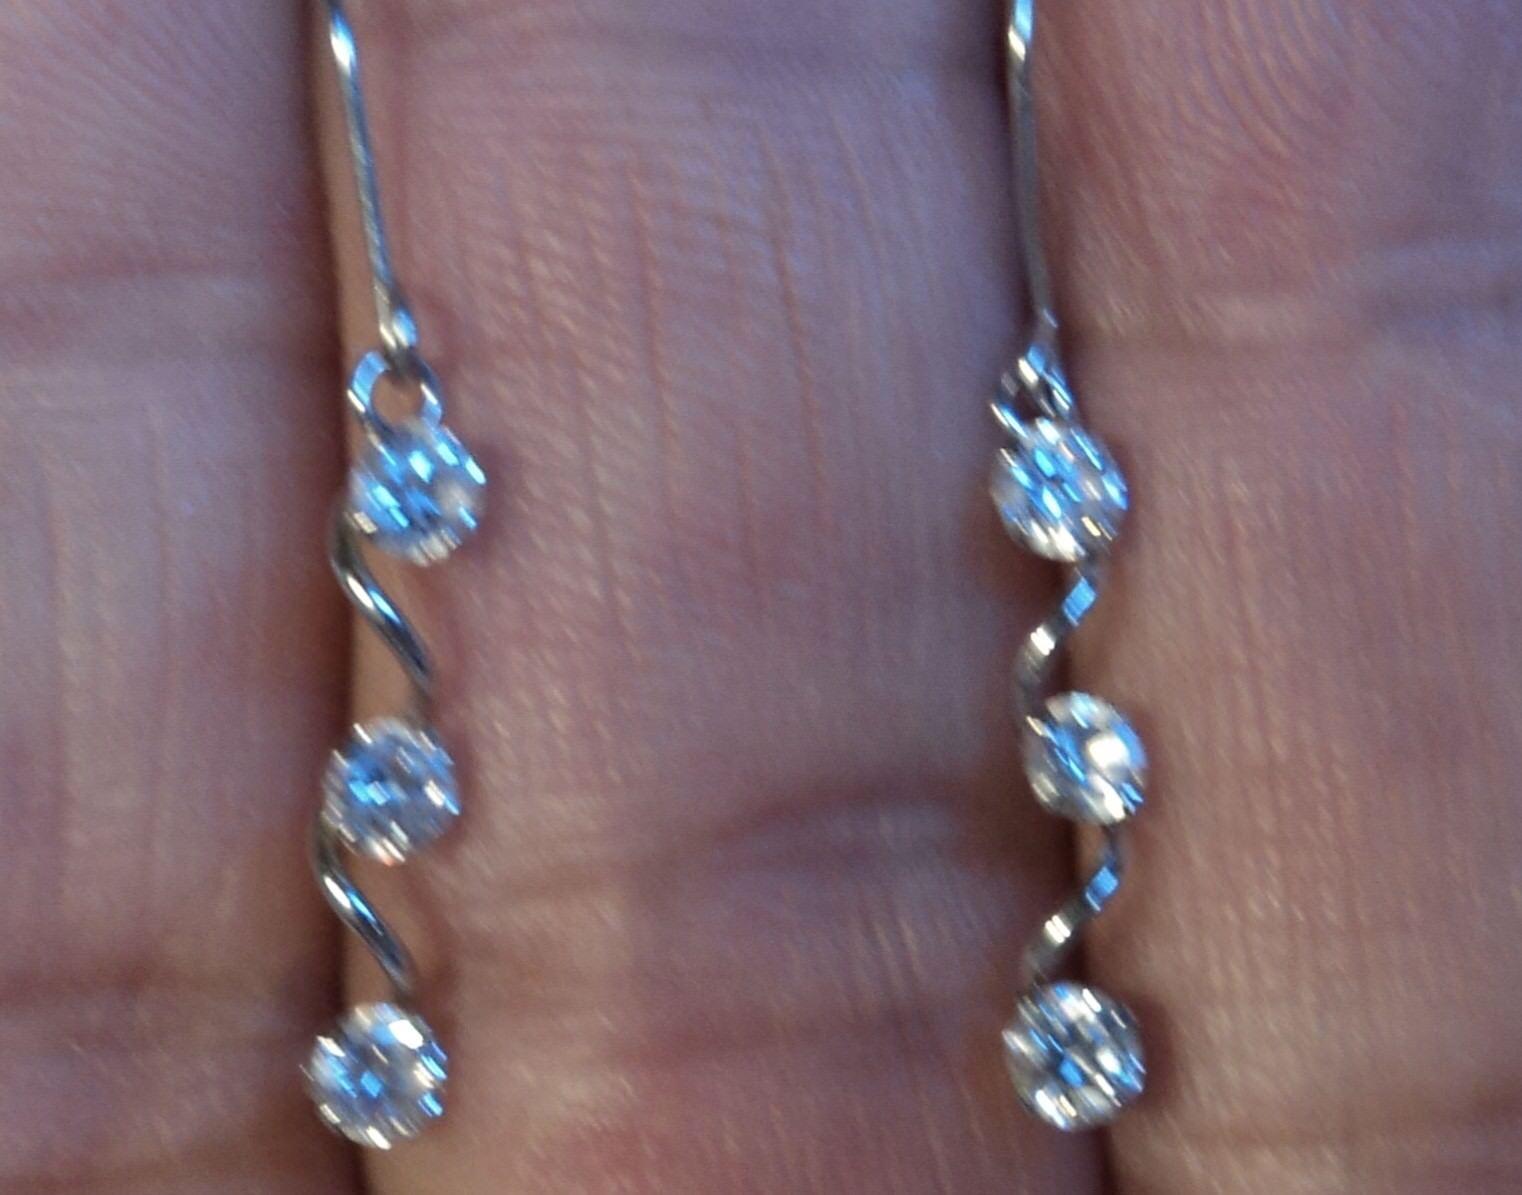 10Kt White gold Spiral Dangle Earrings Triple CZ Stones 1.2  Long .5 TCW